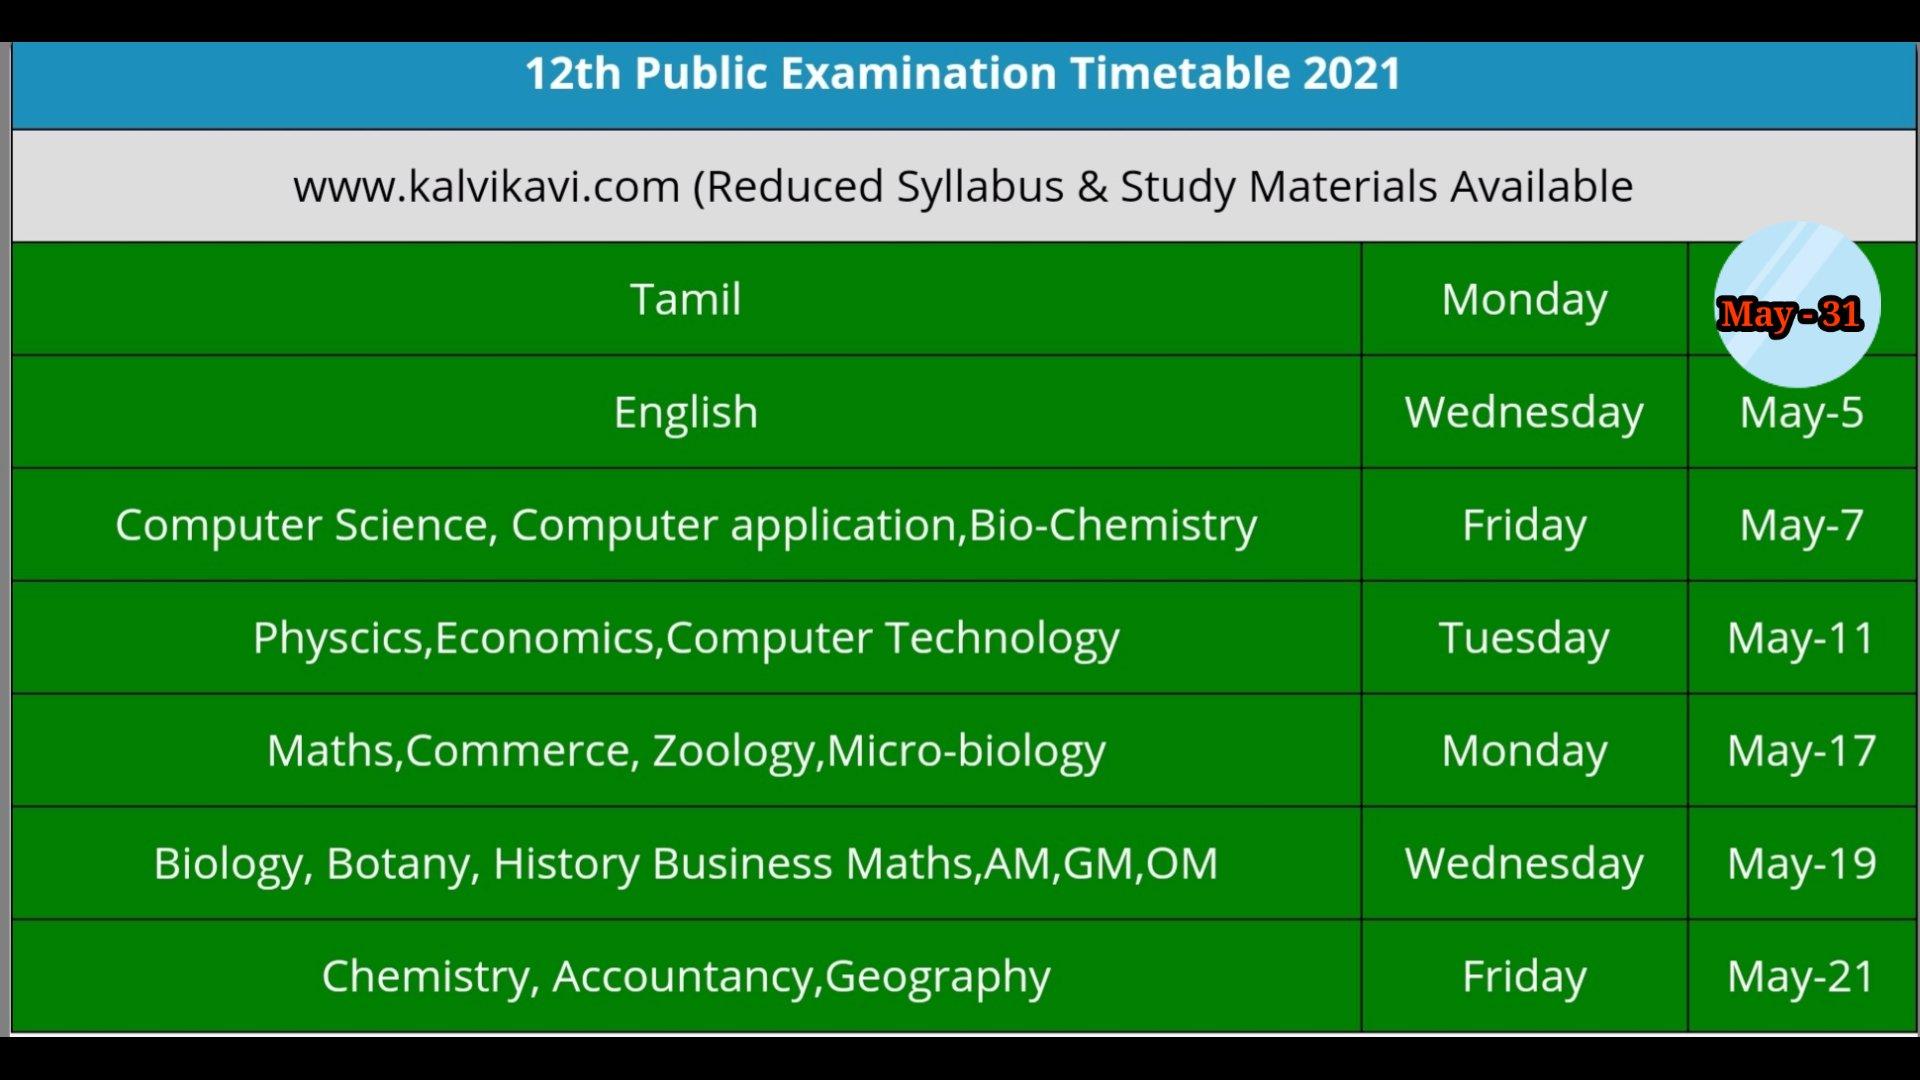 12th Public Exam Time Table 2021 - Tamilnadu